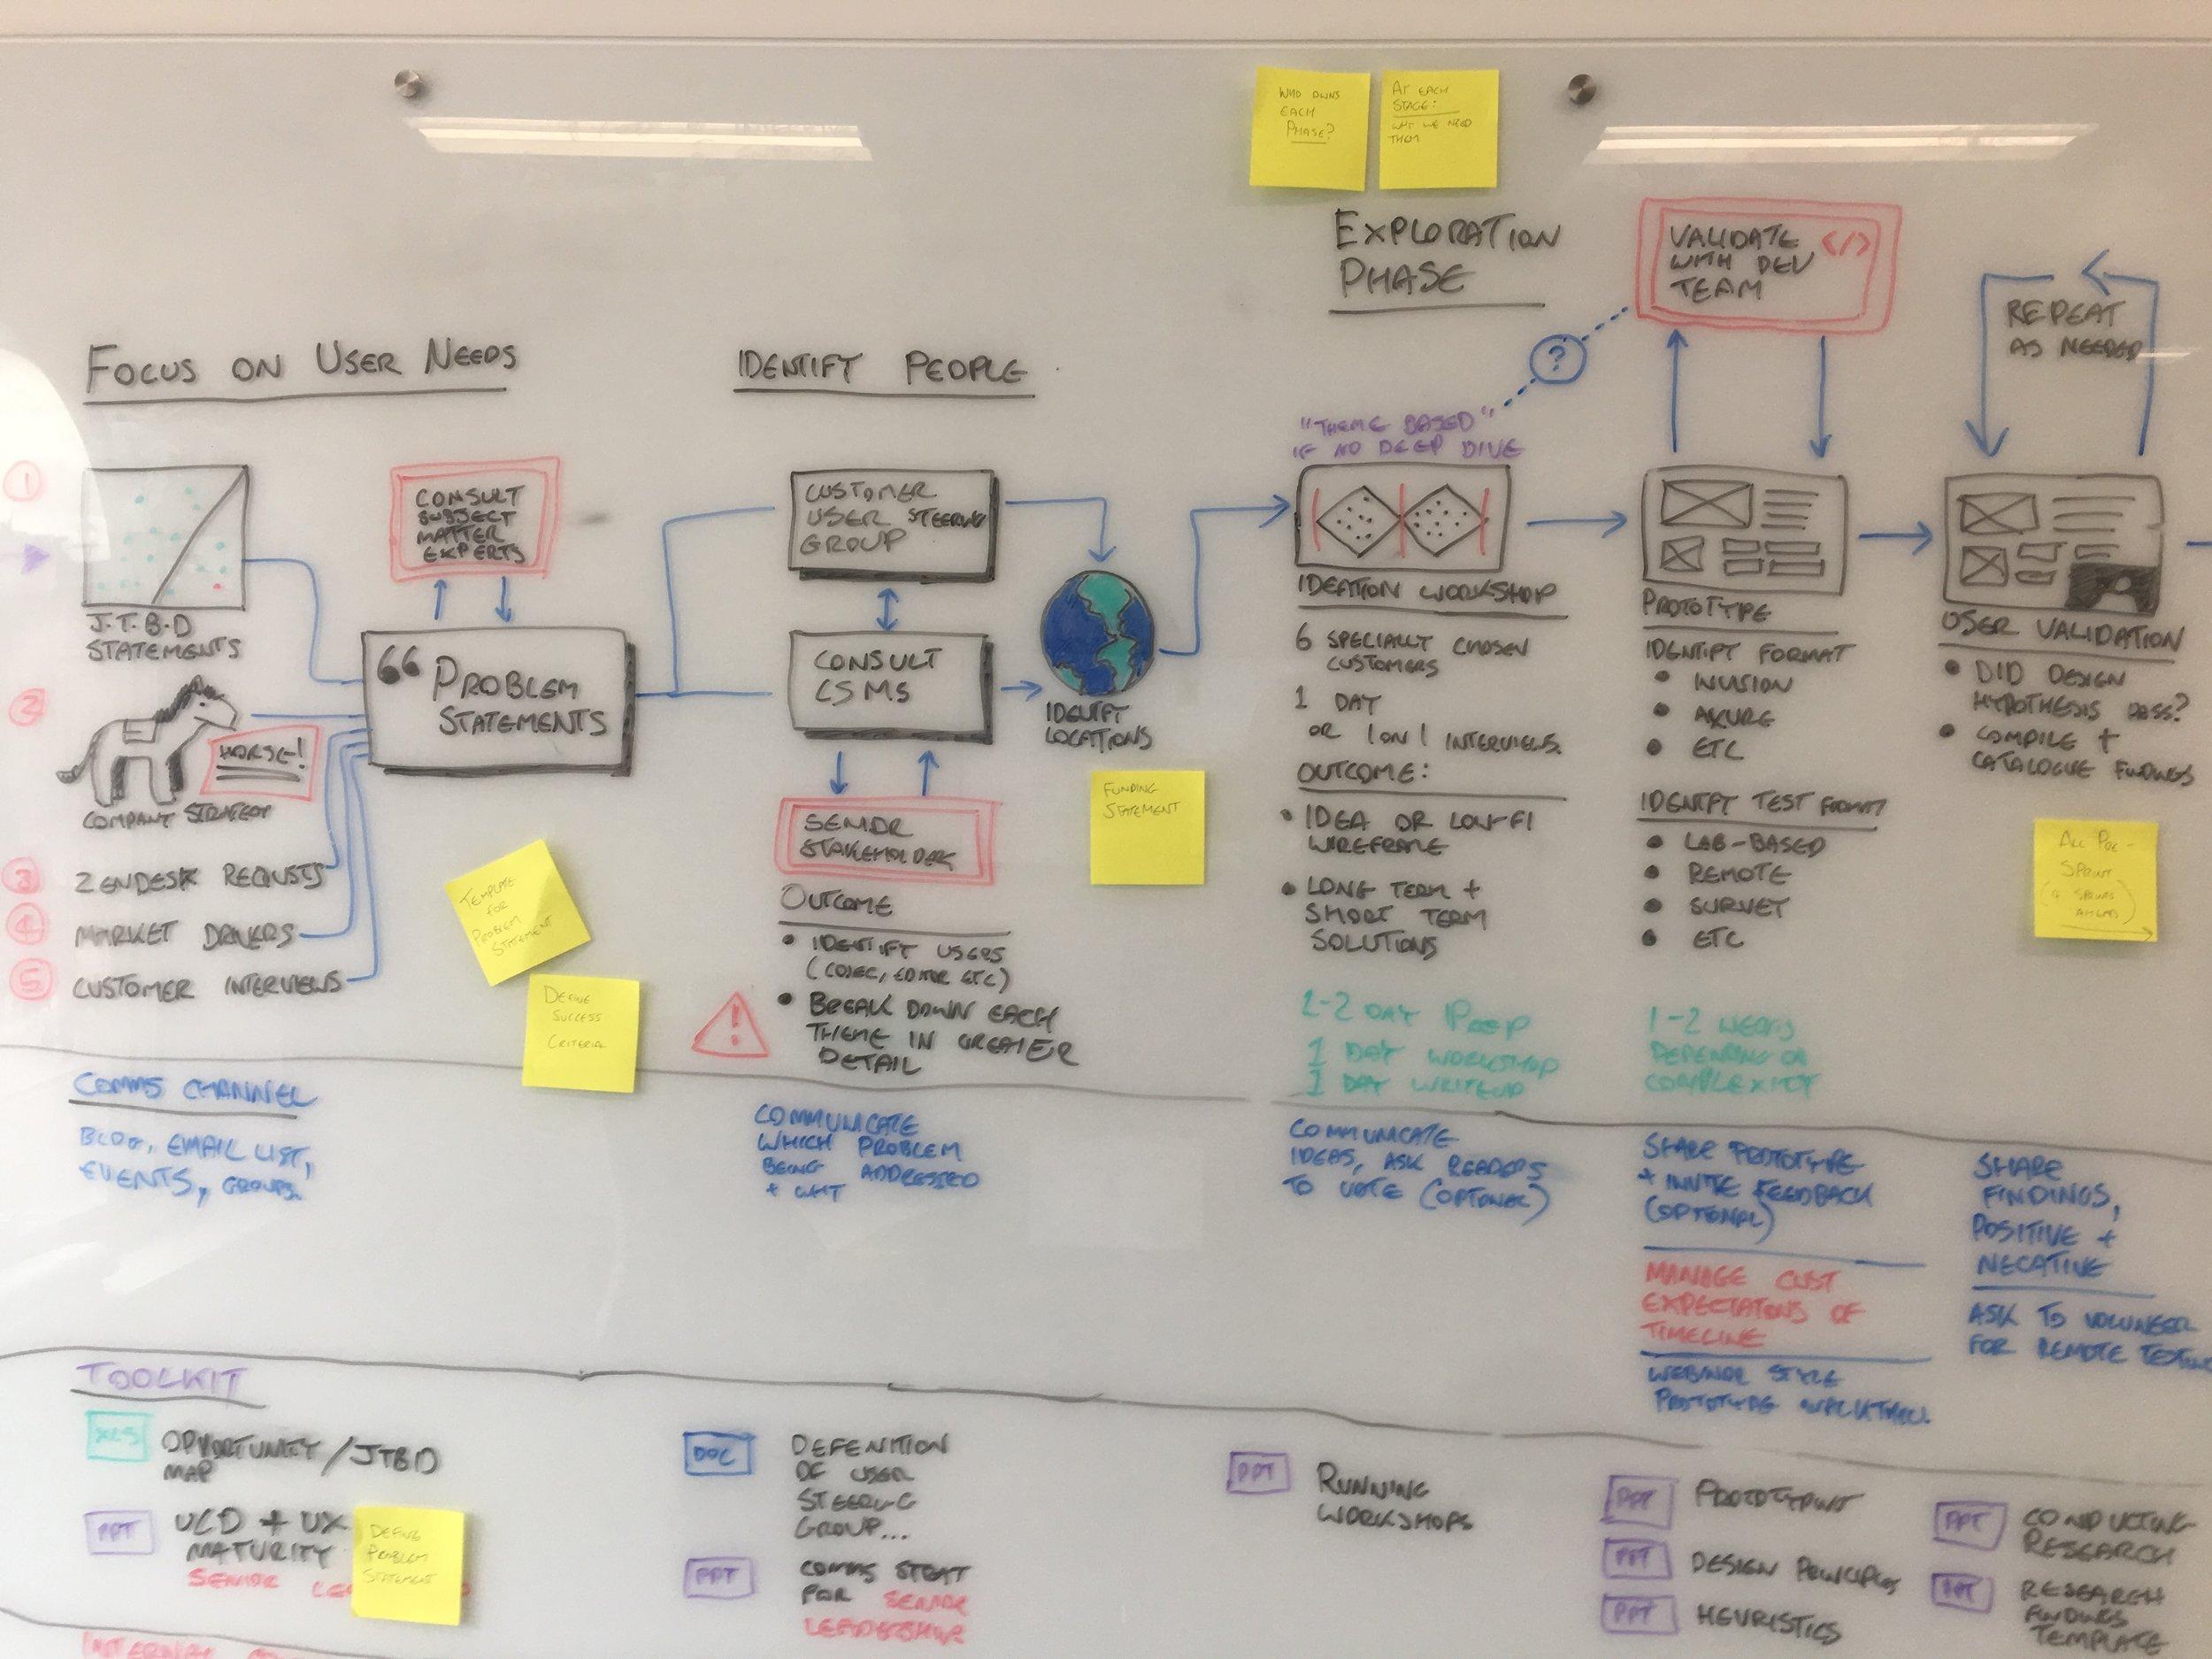 My original plan for the roadmap